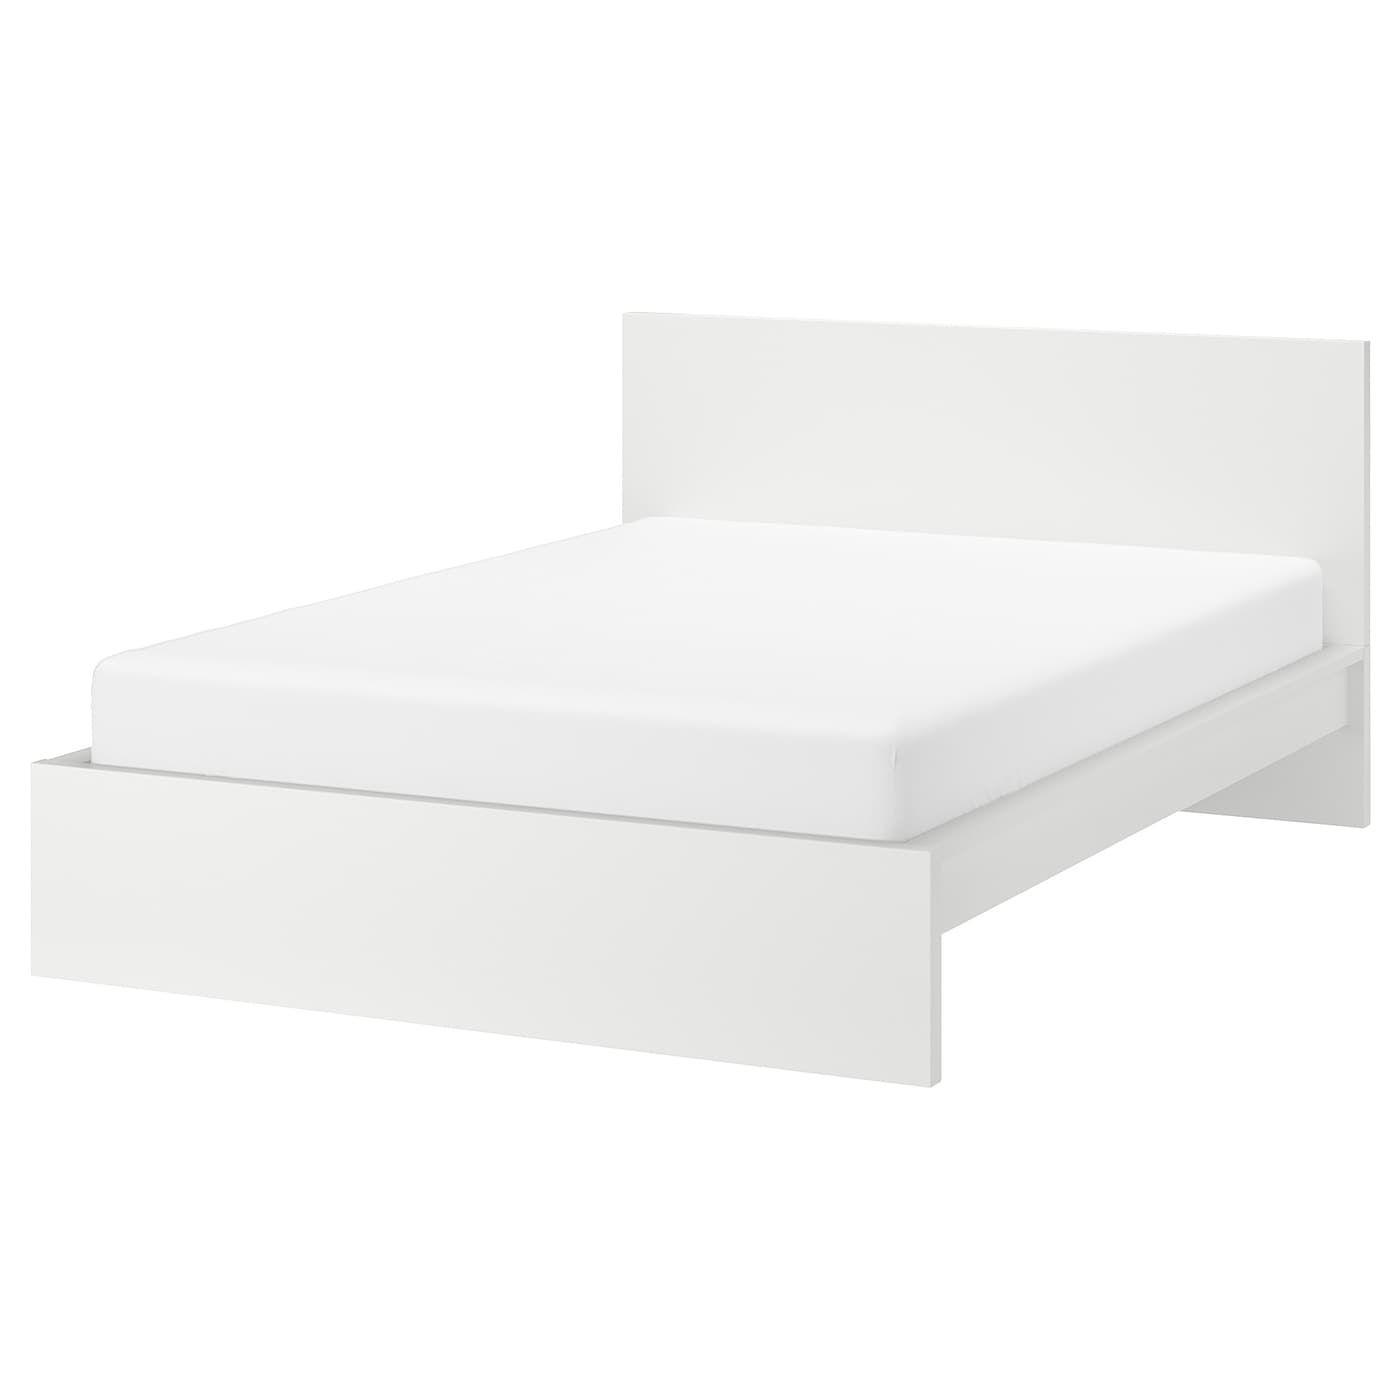 Malm Bettgestell Hoch Weiss Ikea Deutschland In 2020 Ikea Malm Bett Bett Lagerung Und Schlafzimmermobel